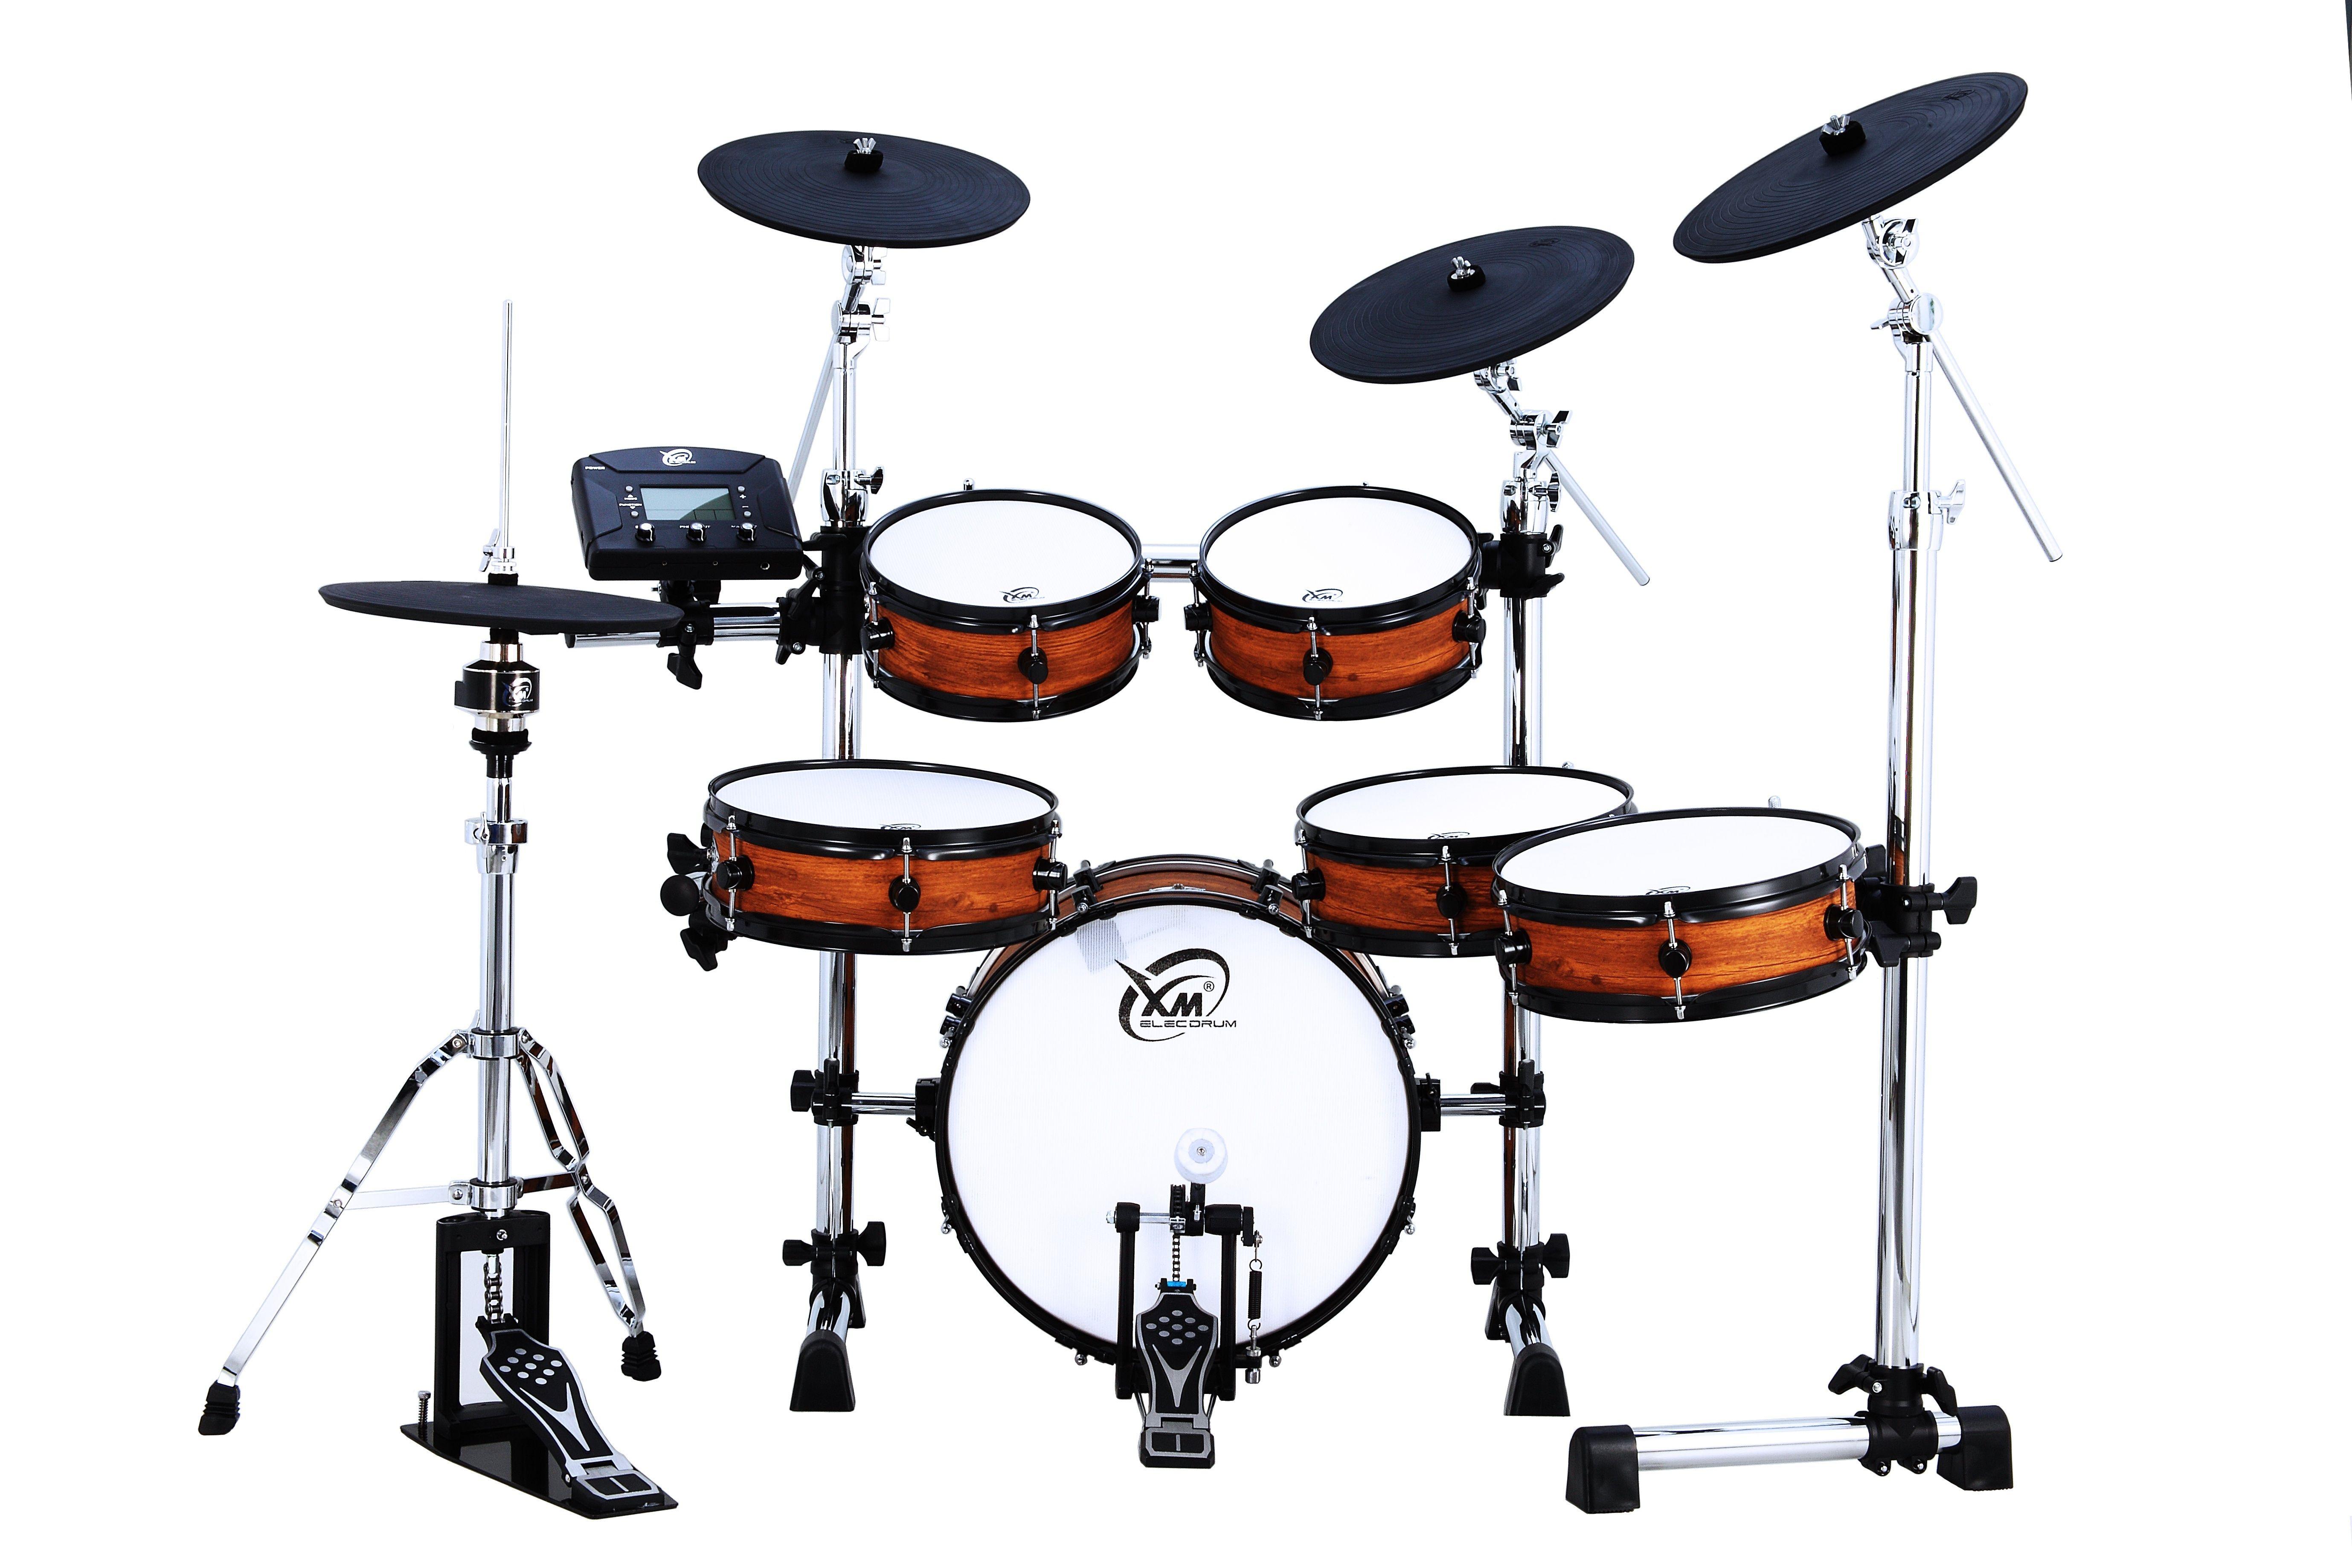 the xm classy series c plus 9sr electronic drum kit drum 39 s in 2019 drums drum kits. Black Bedroom Furniture Sets. Home Design Ideas